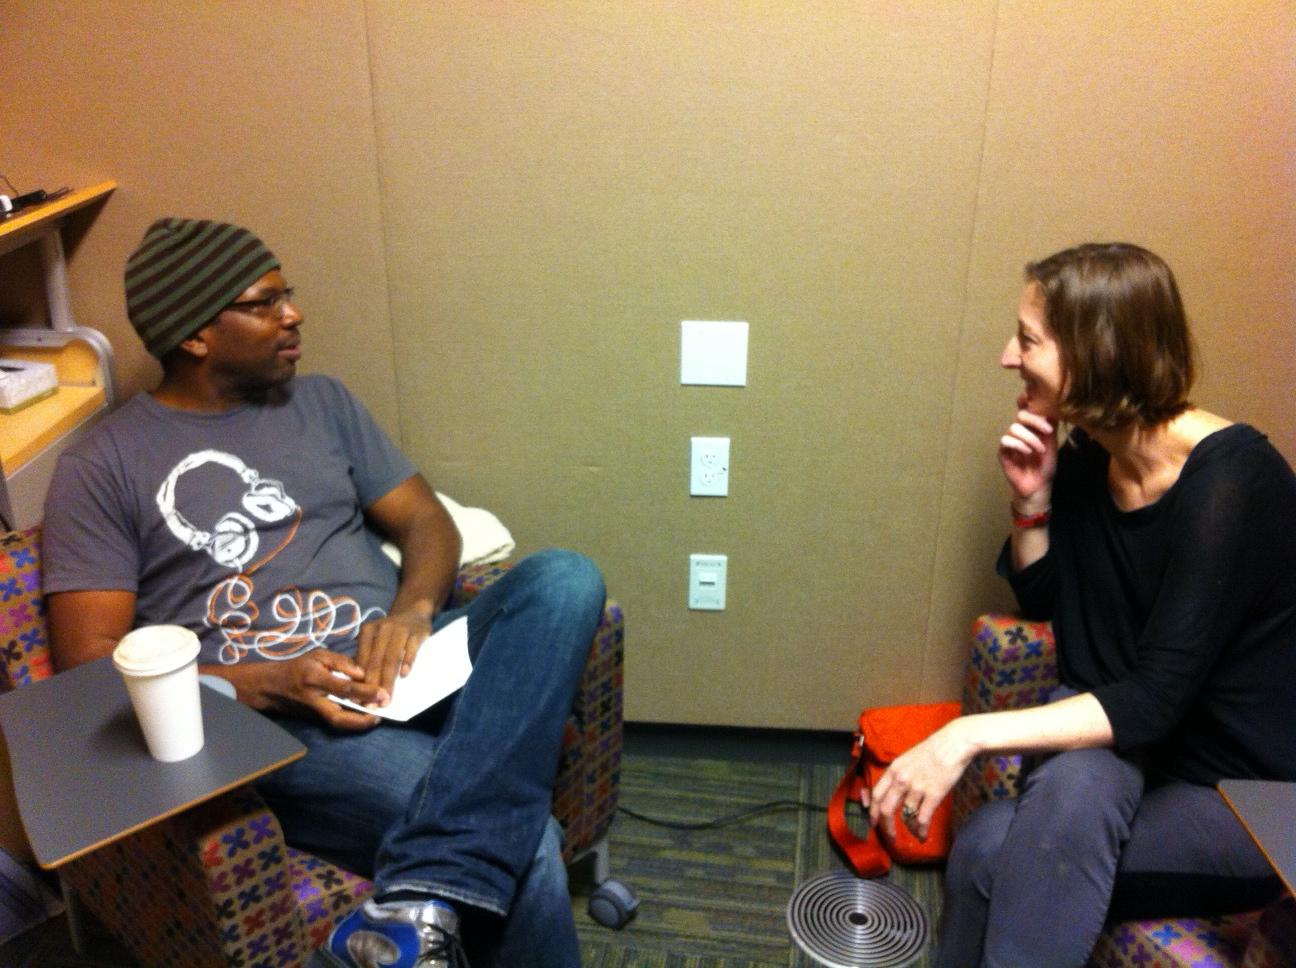 TPR's Jess Van Nostrand interviewing Paul Rucker in February 2014